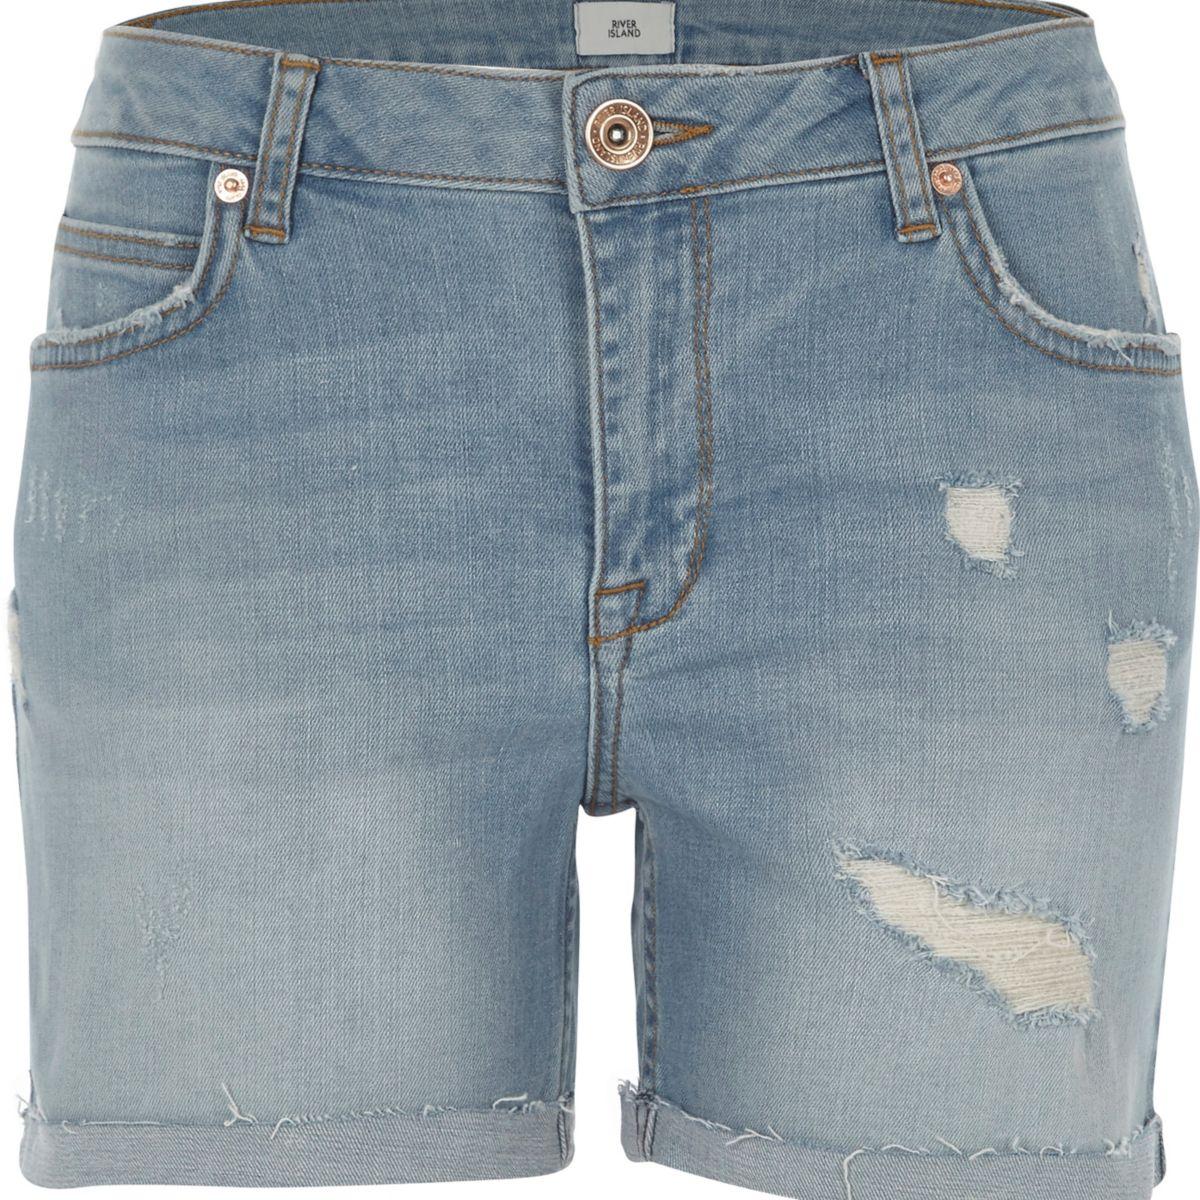 Blue wash distressed denim boyfriend shorts